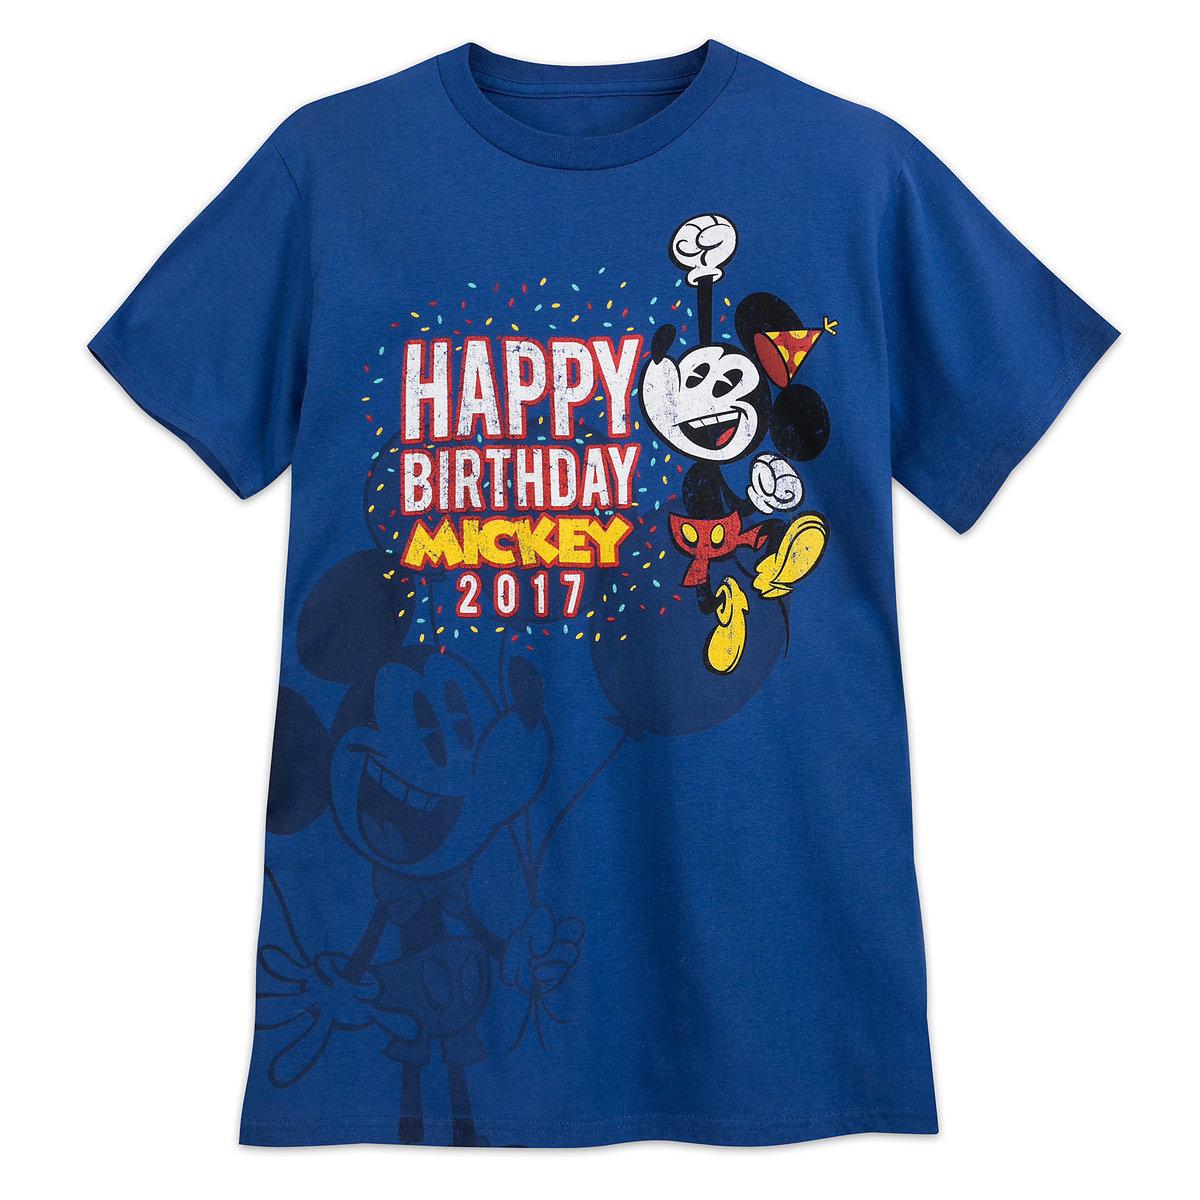 5 shopDisney Items to Celebrate Mickey's Birthday